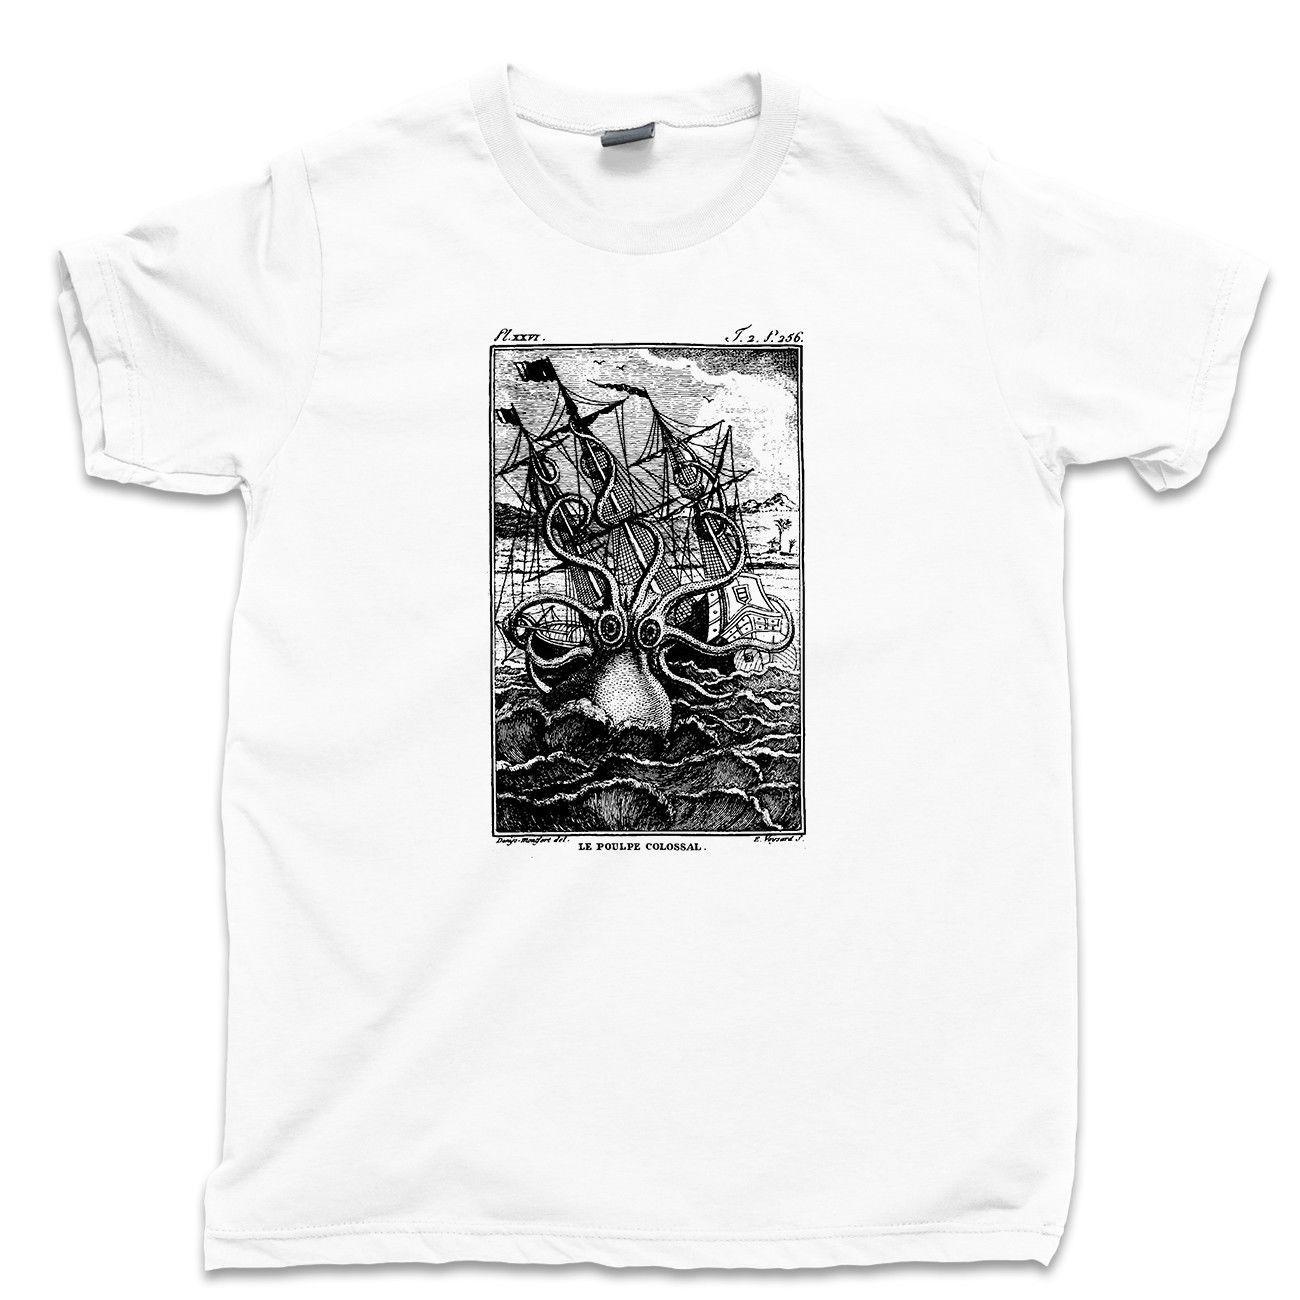 Kraken Giant Octopus T Shirt Pirate Phantom Ghost Ship